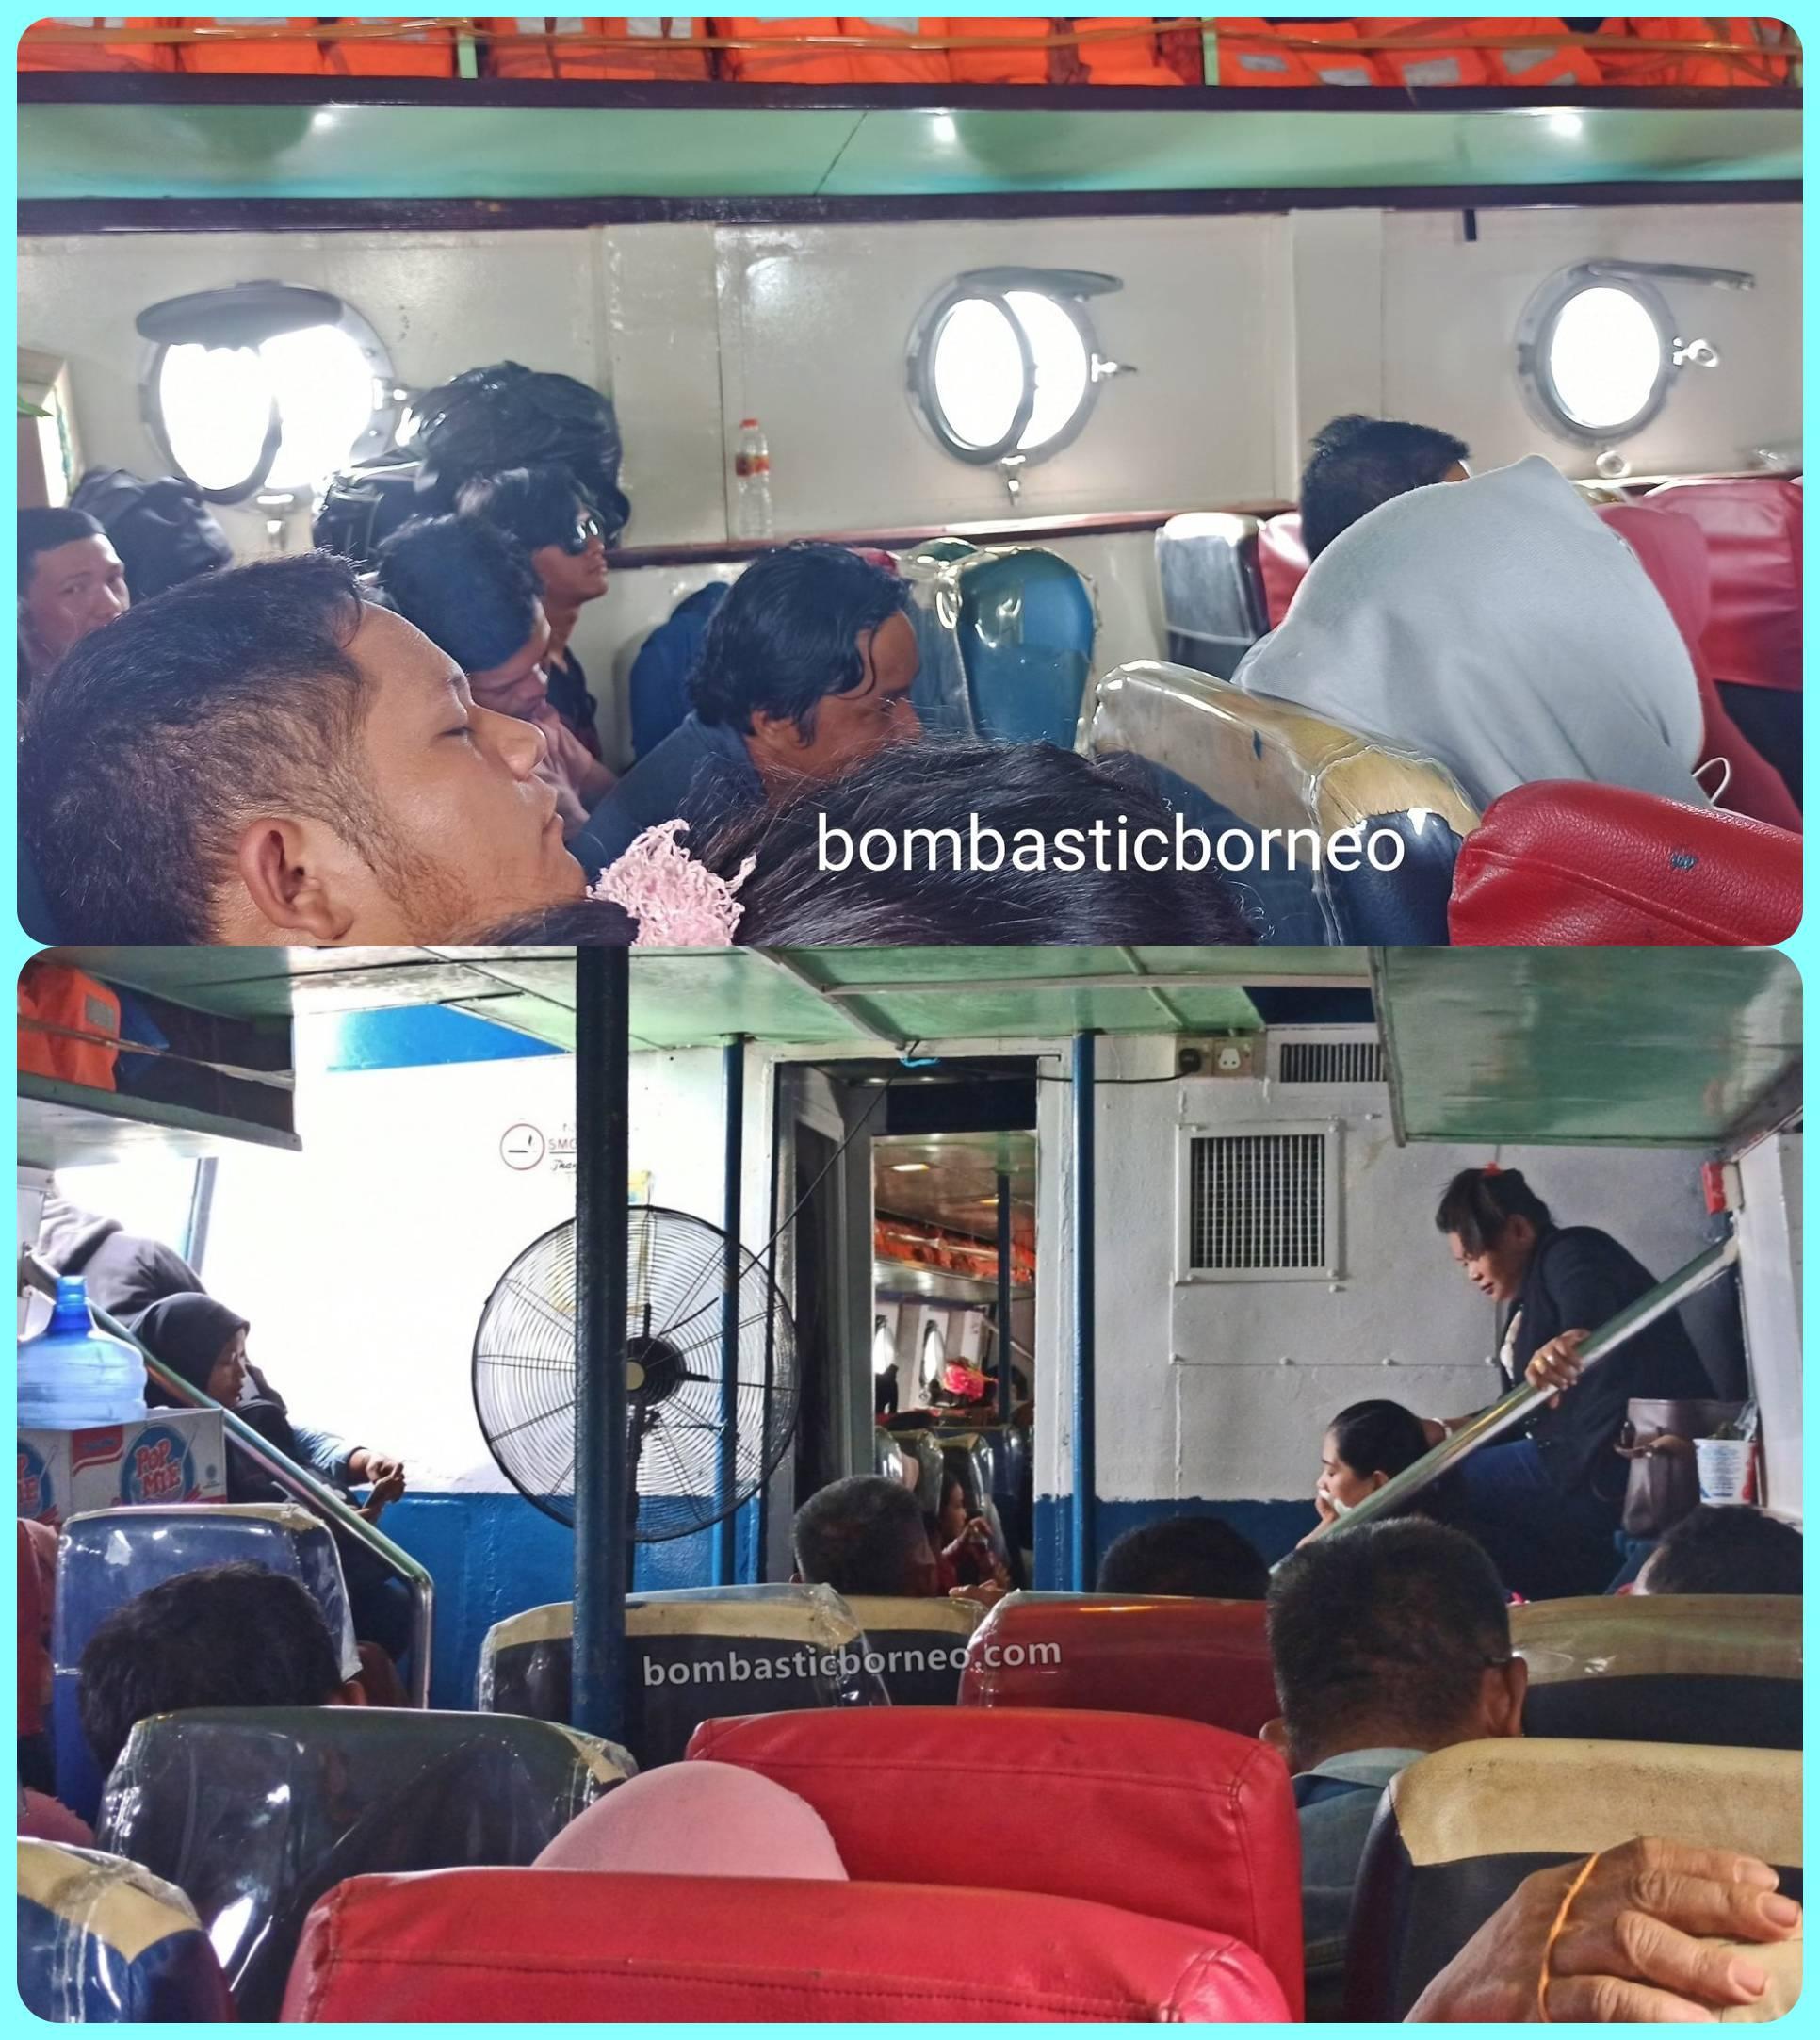 ferry, express boat, Kapal Besar, international, Transportation, backpackers, destination, exploration, Indonesia, North Kalimantan, Tourism, Cross Border, Borneo, 穿越婆罗洲游踪, 印尼北加里曼丹